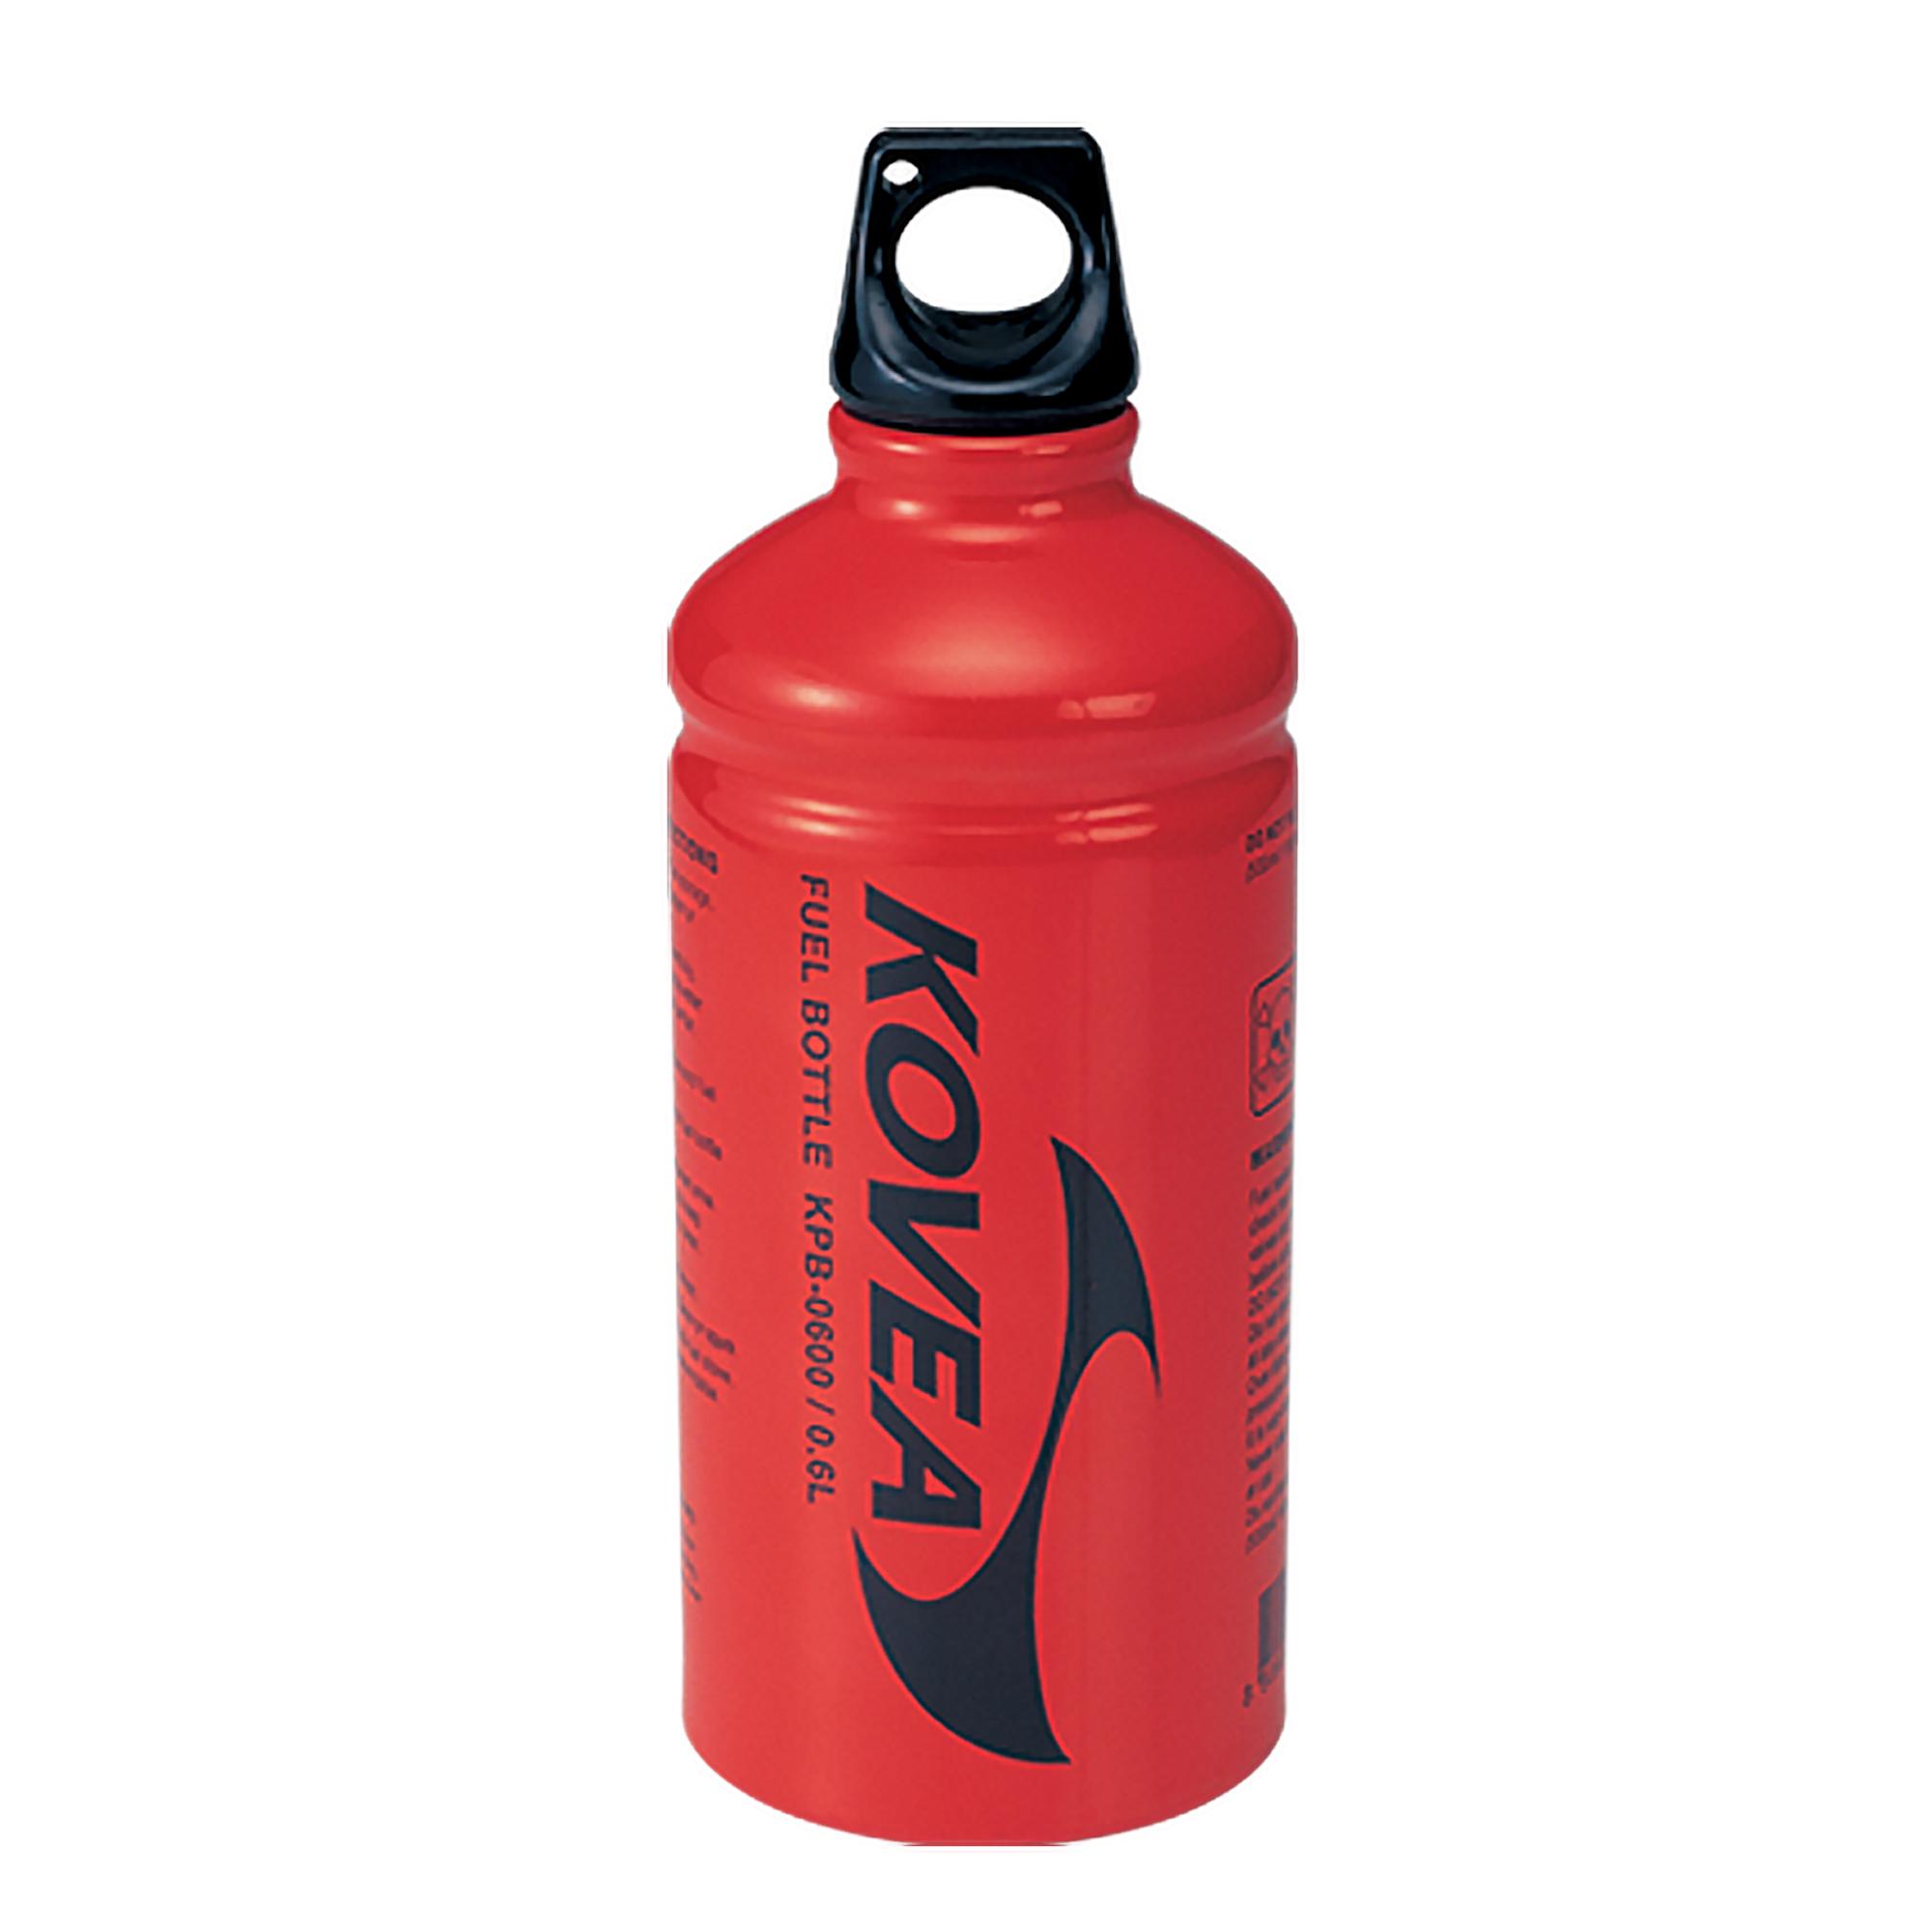 Фото - Фляга для топлива Kovea Fuel Bottle 0.6 KPB-0600 KPB-0600